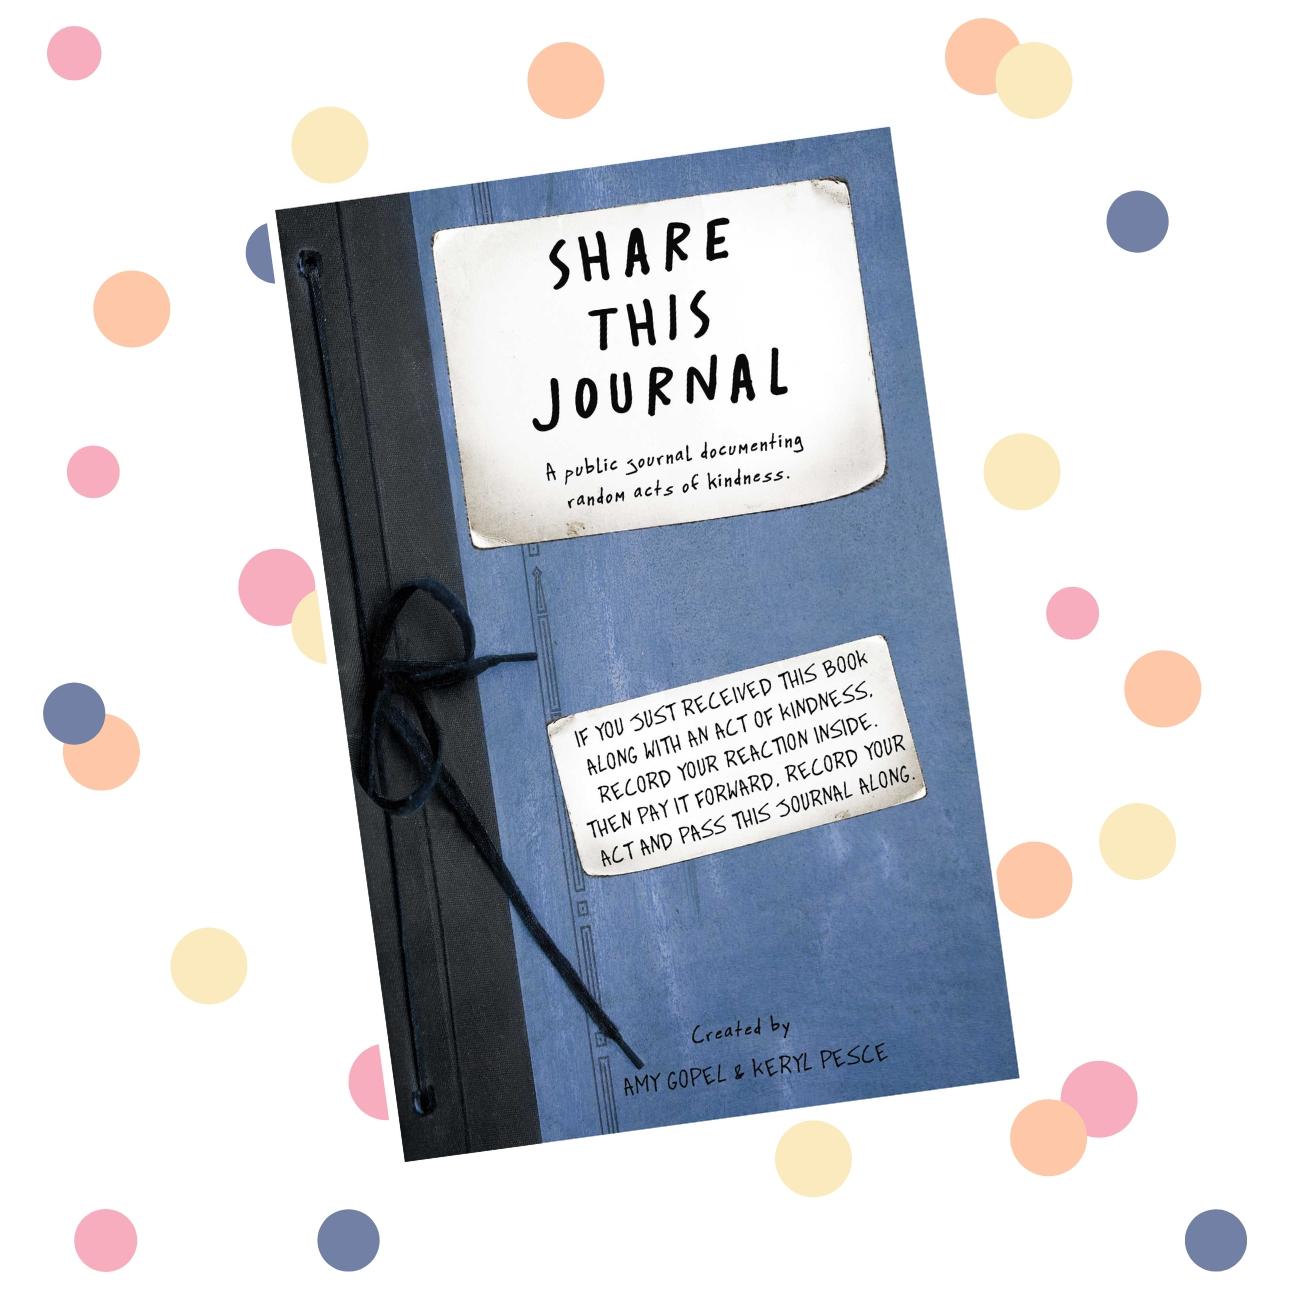 random acts of kindness dagboeken - share this journal